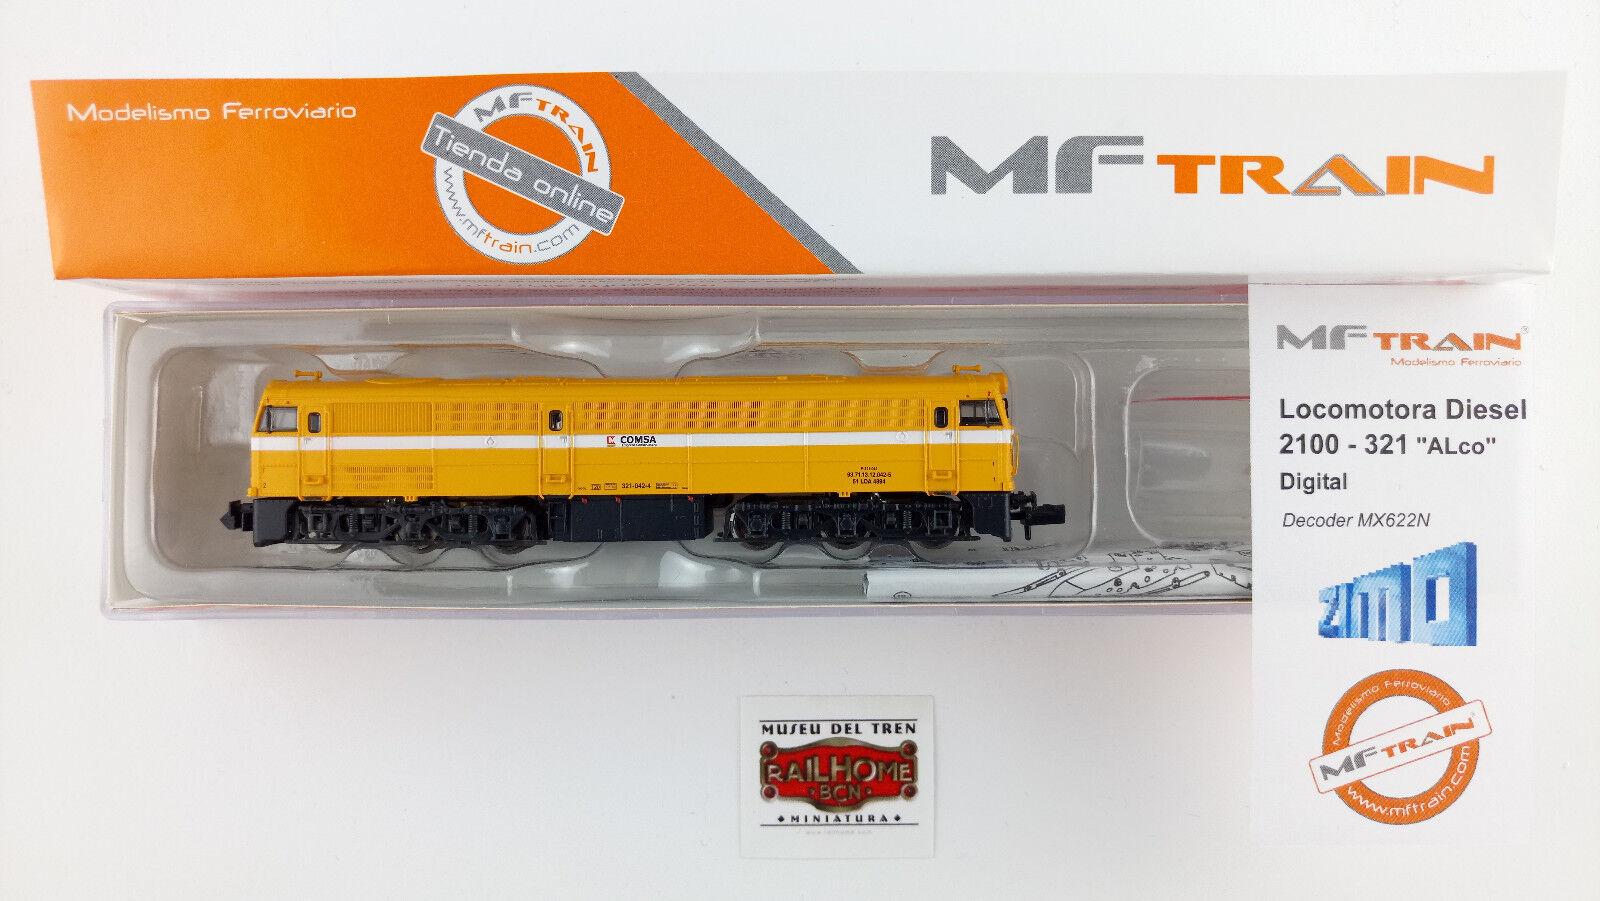 MFTRAIN N13222 - DIESEL-LOK 321-042-4  COMSA  - DCC ZIMO - NEW TOP